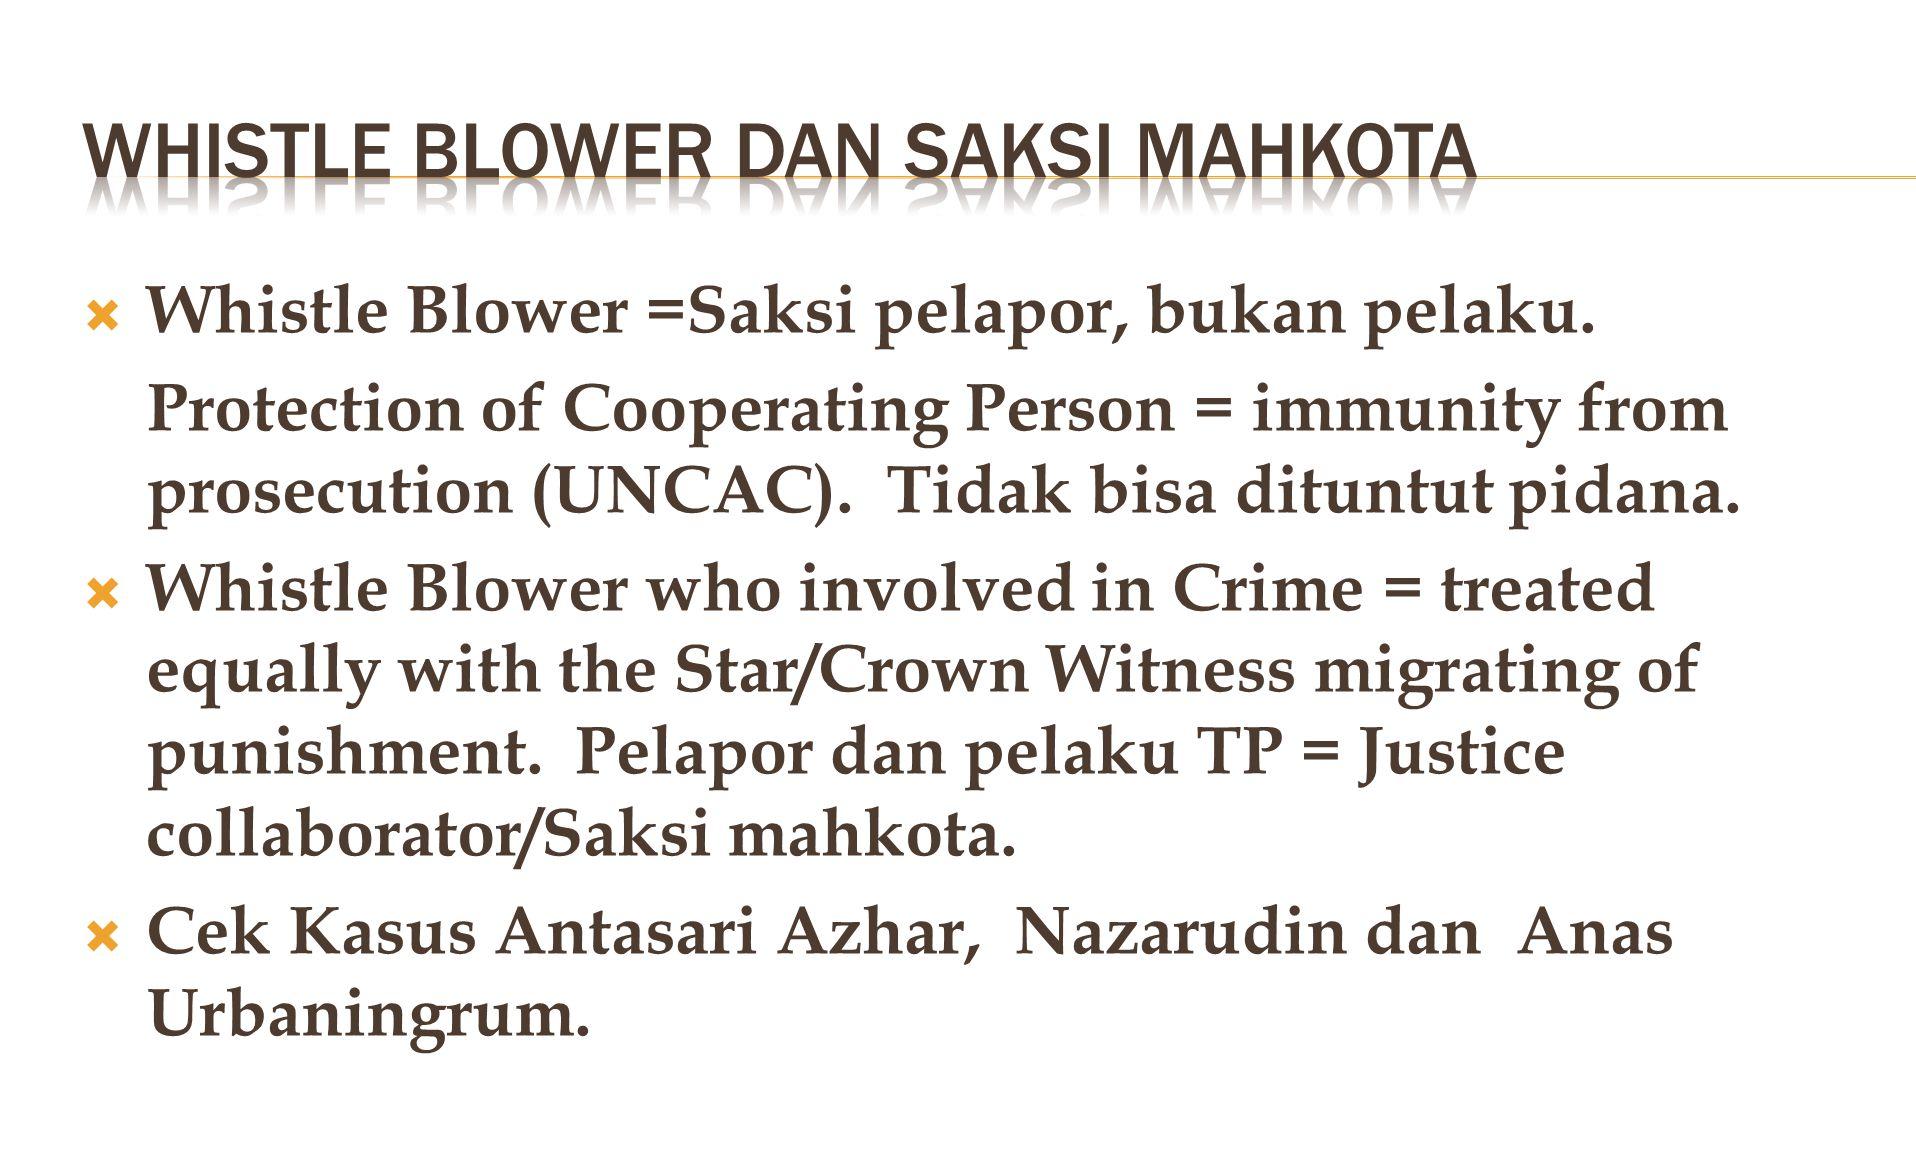  Whistle Blower =Saksi pelapor, bukan pelaku.